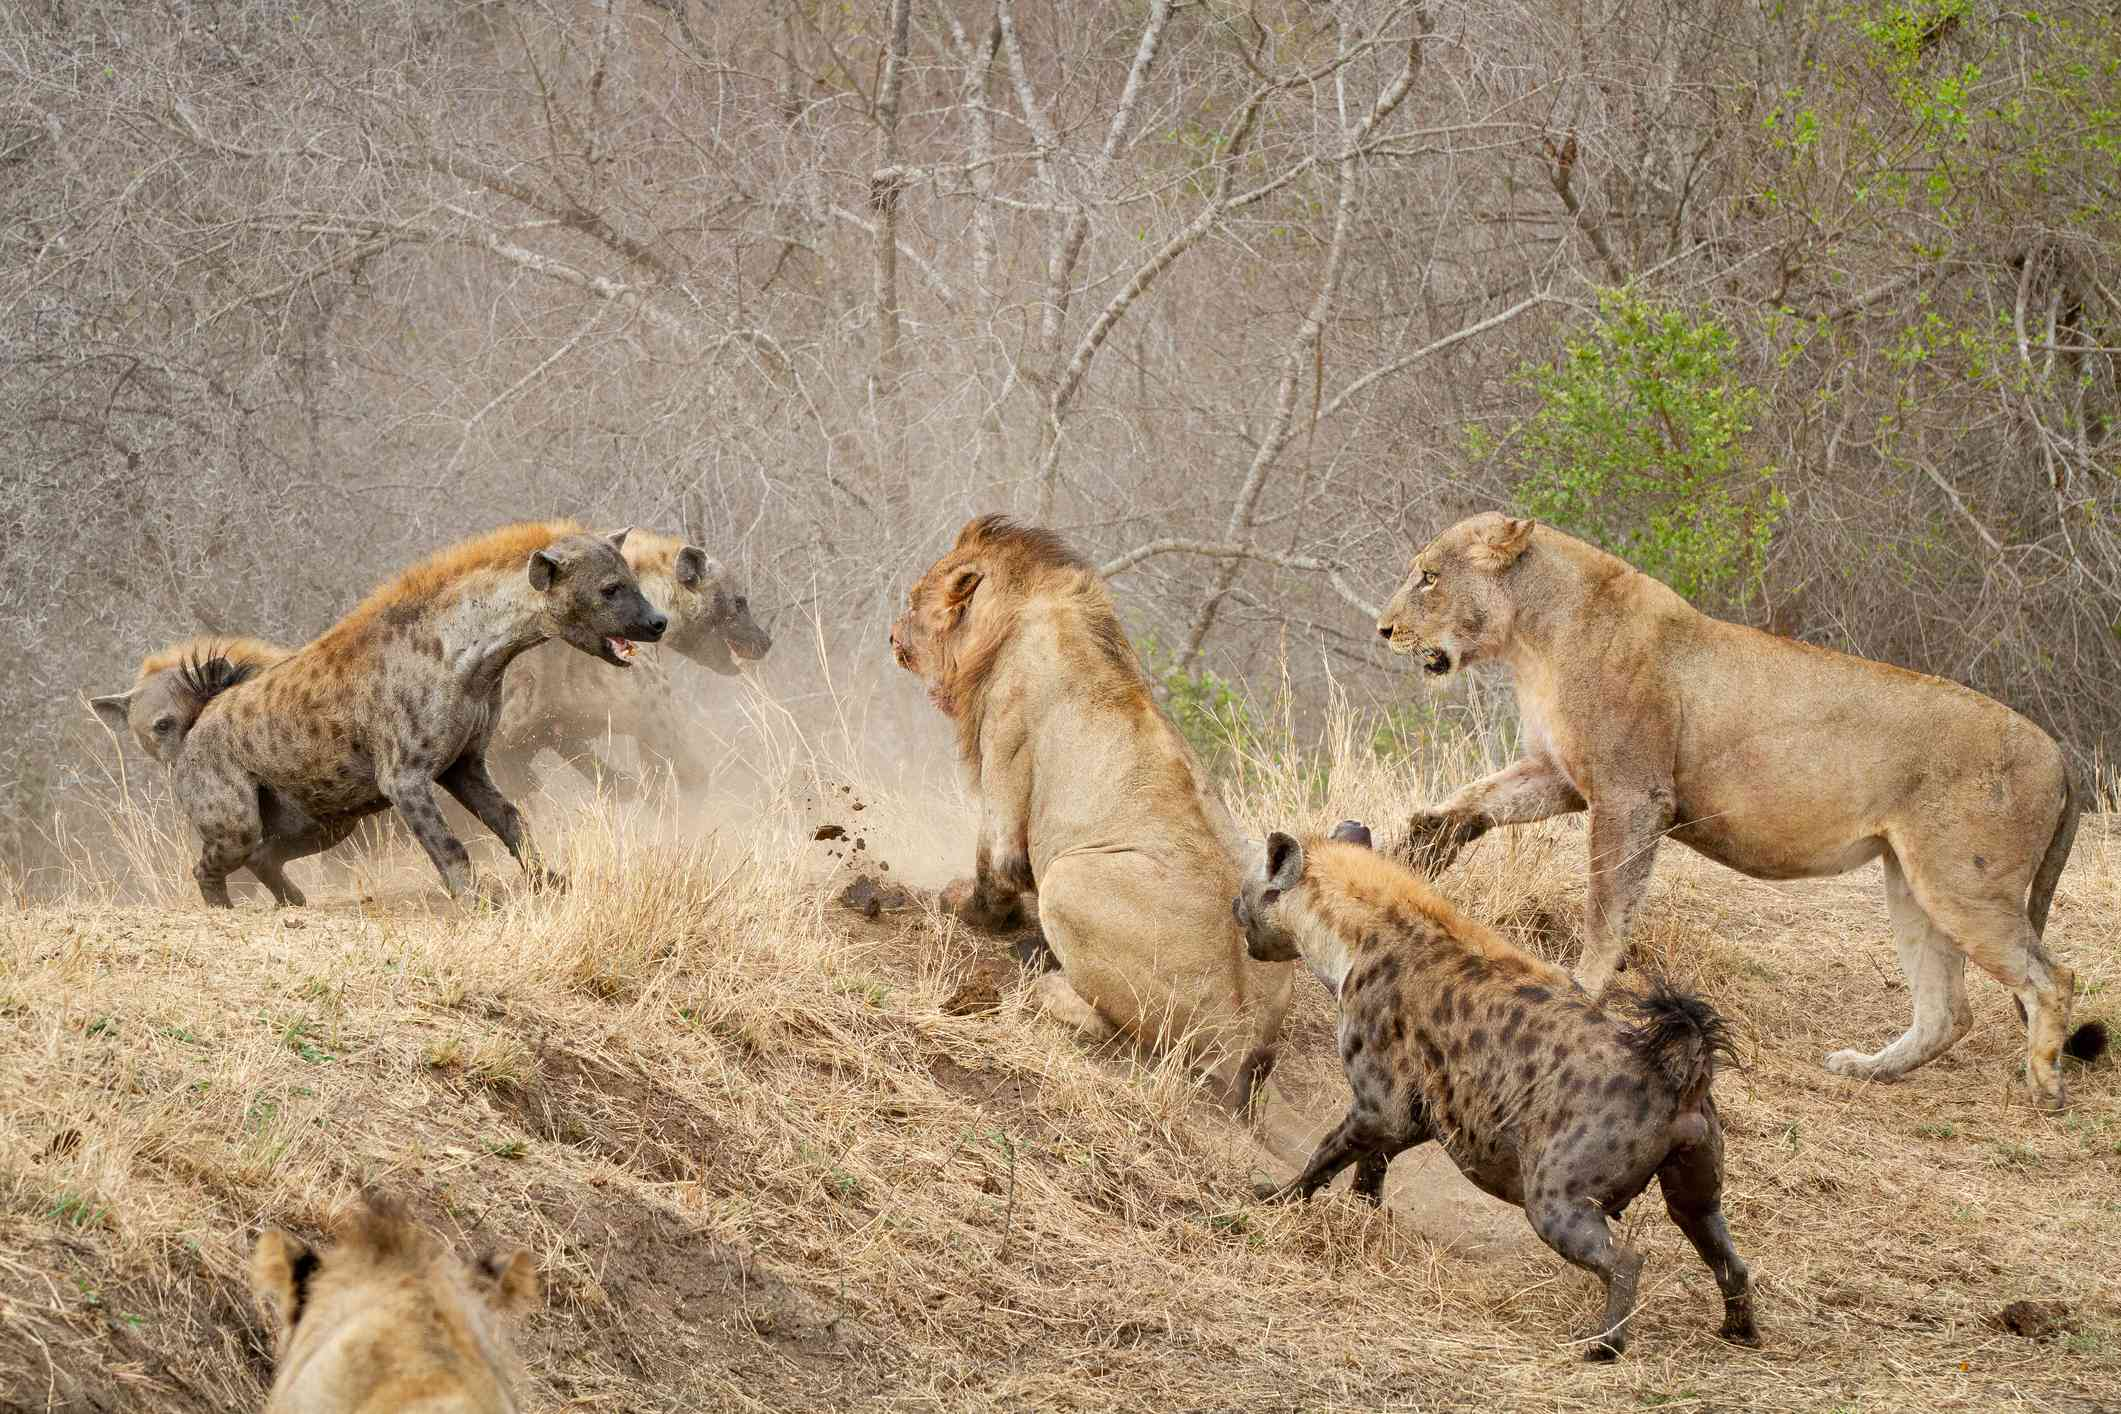 Hyenas attacking lions